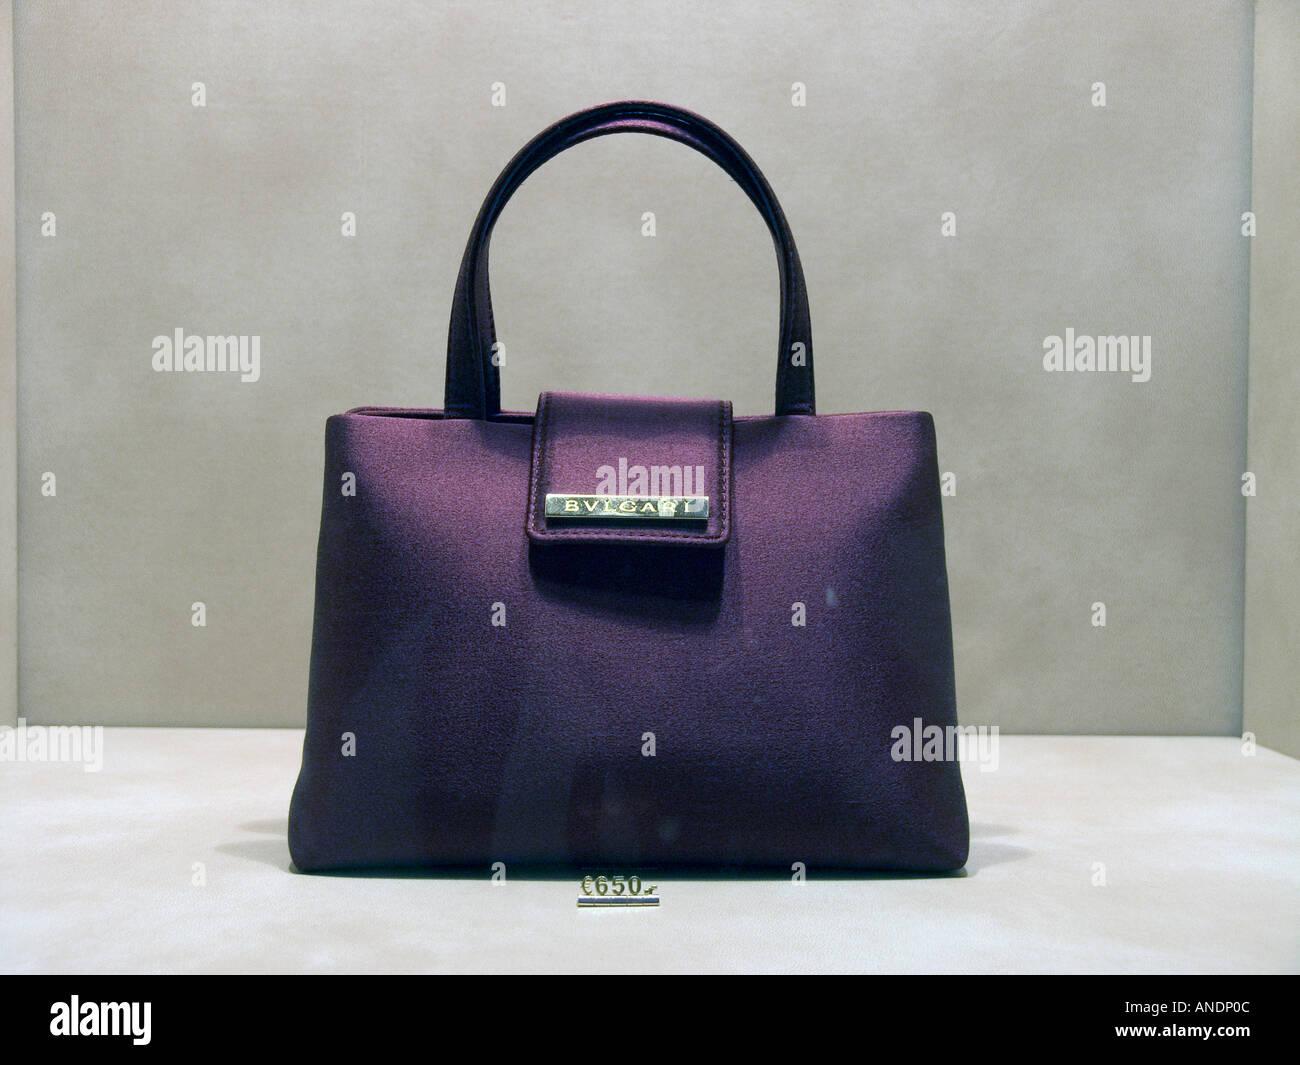 Hand Bag Luxury Product Consume Consumerism Display Price Pricy